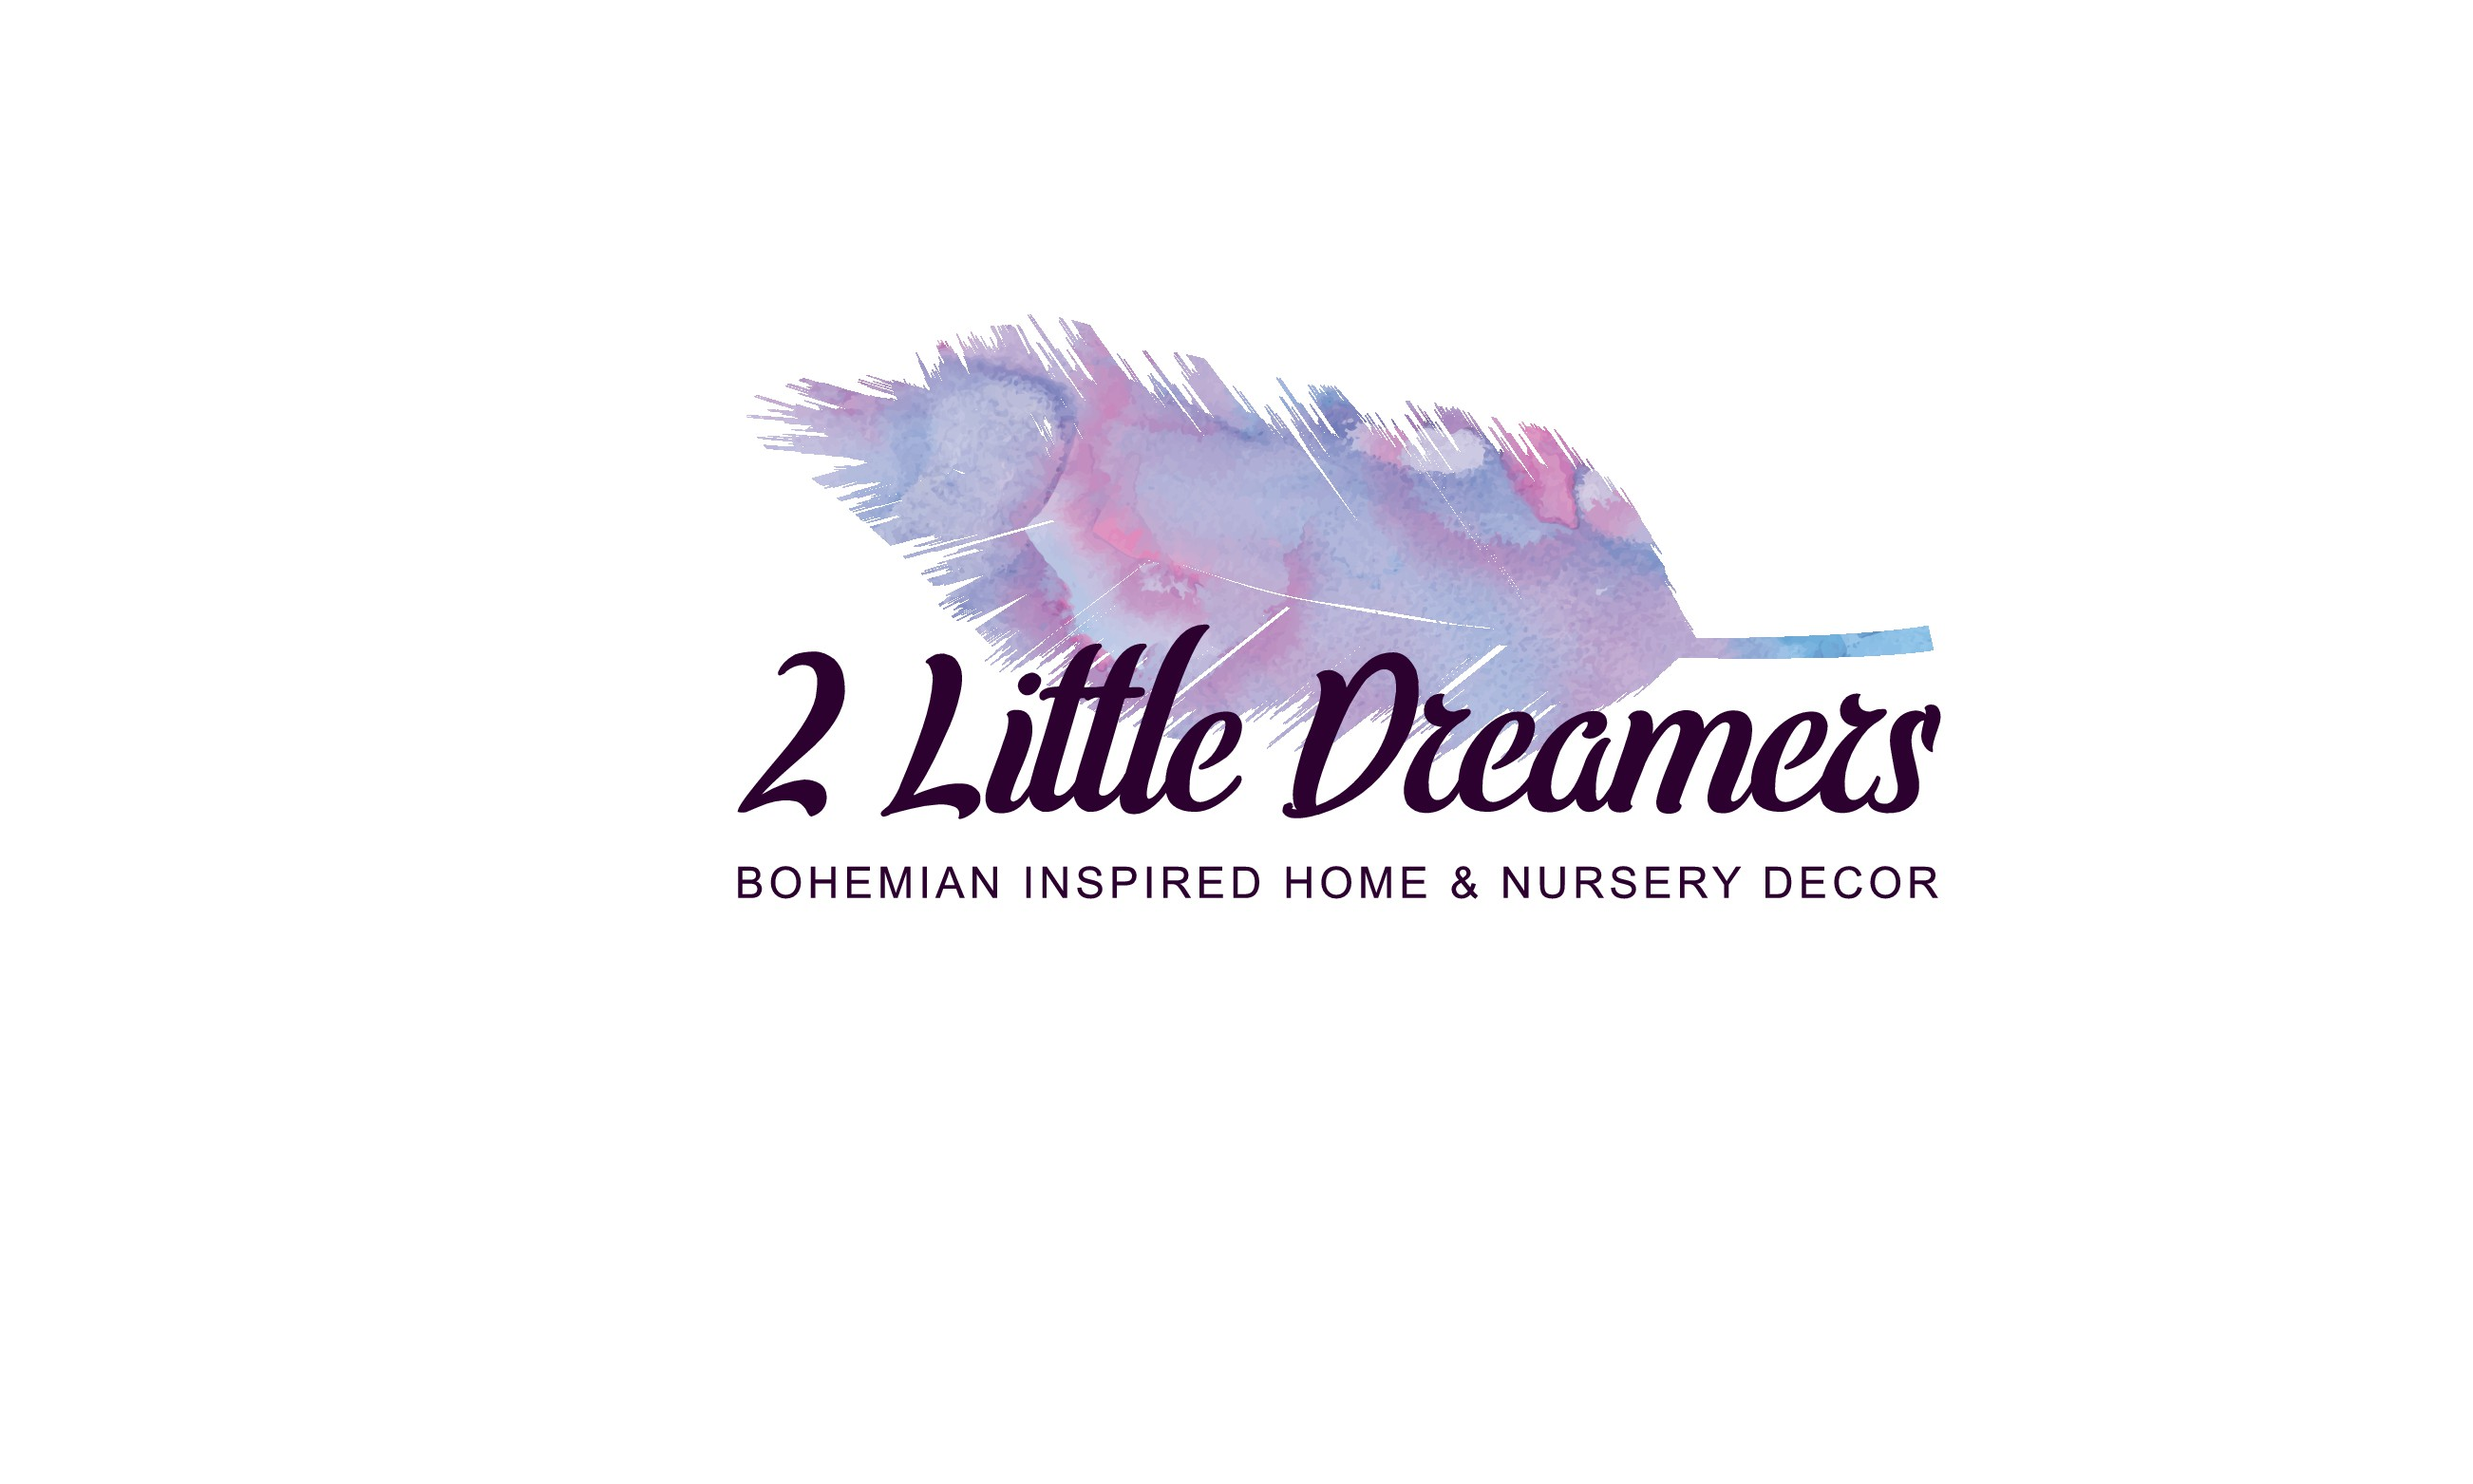 Design a Modenrn Bohemian Logo for Dreamcatcher Business